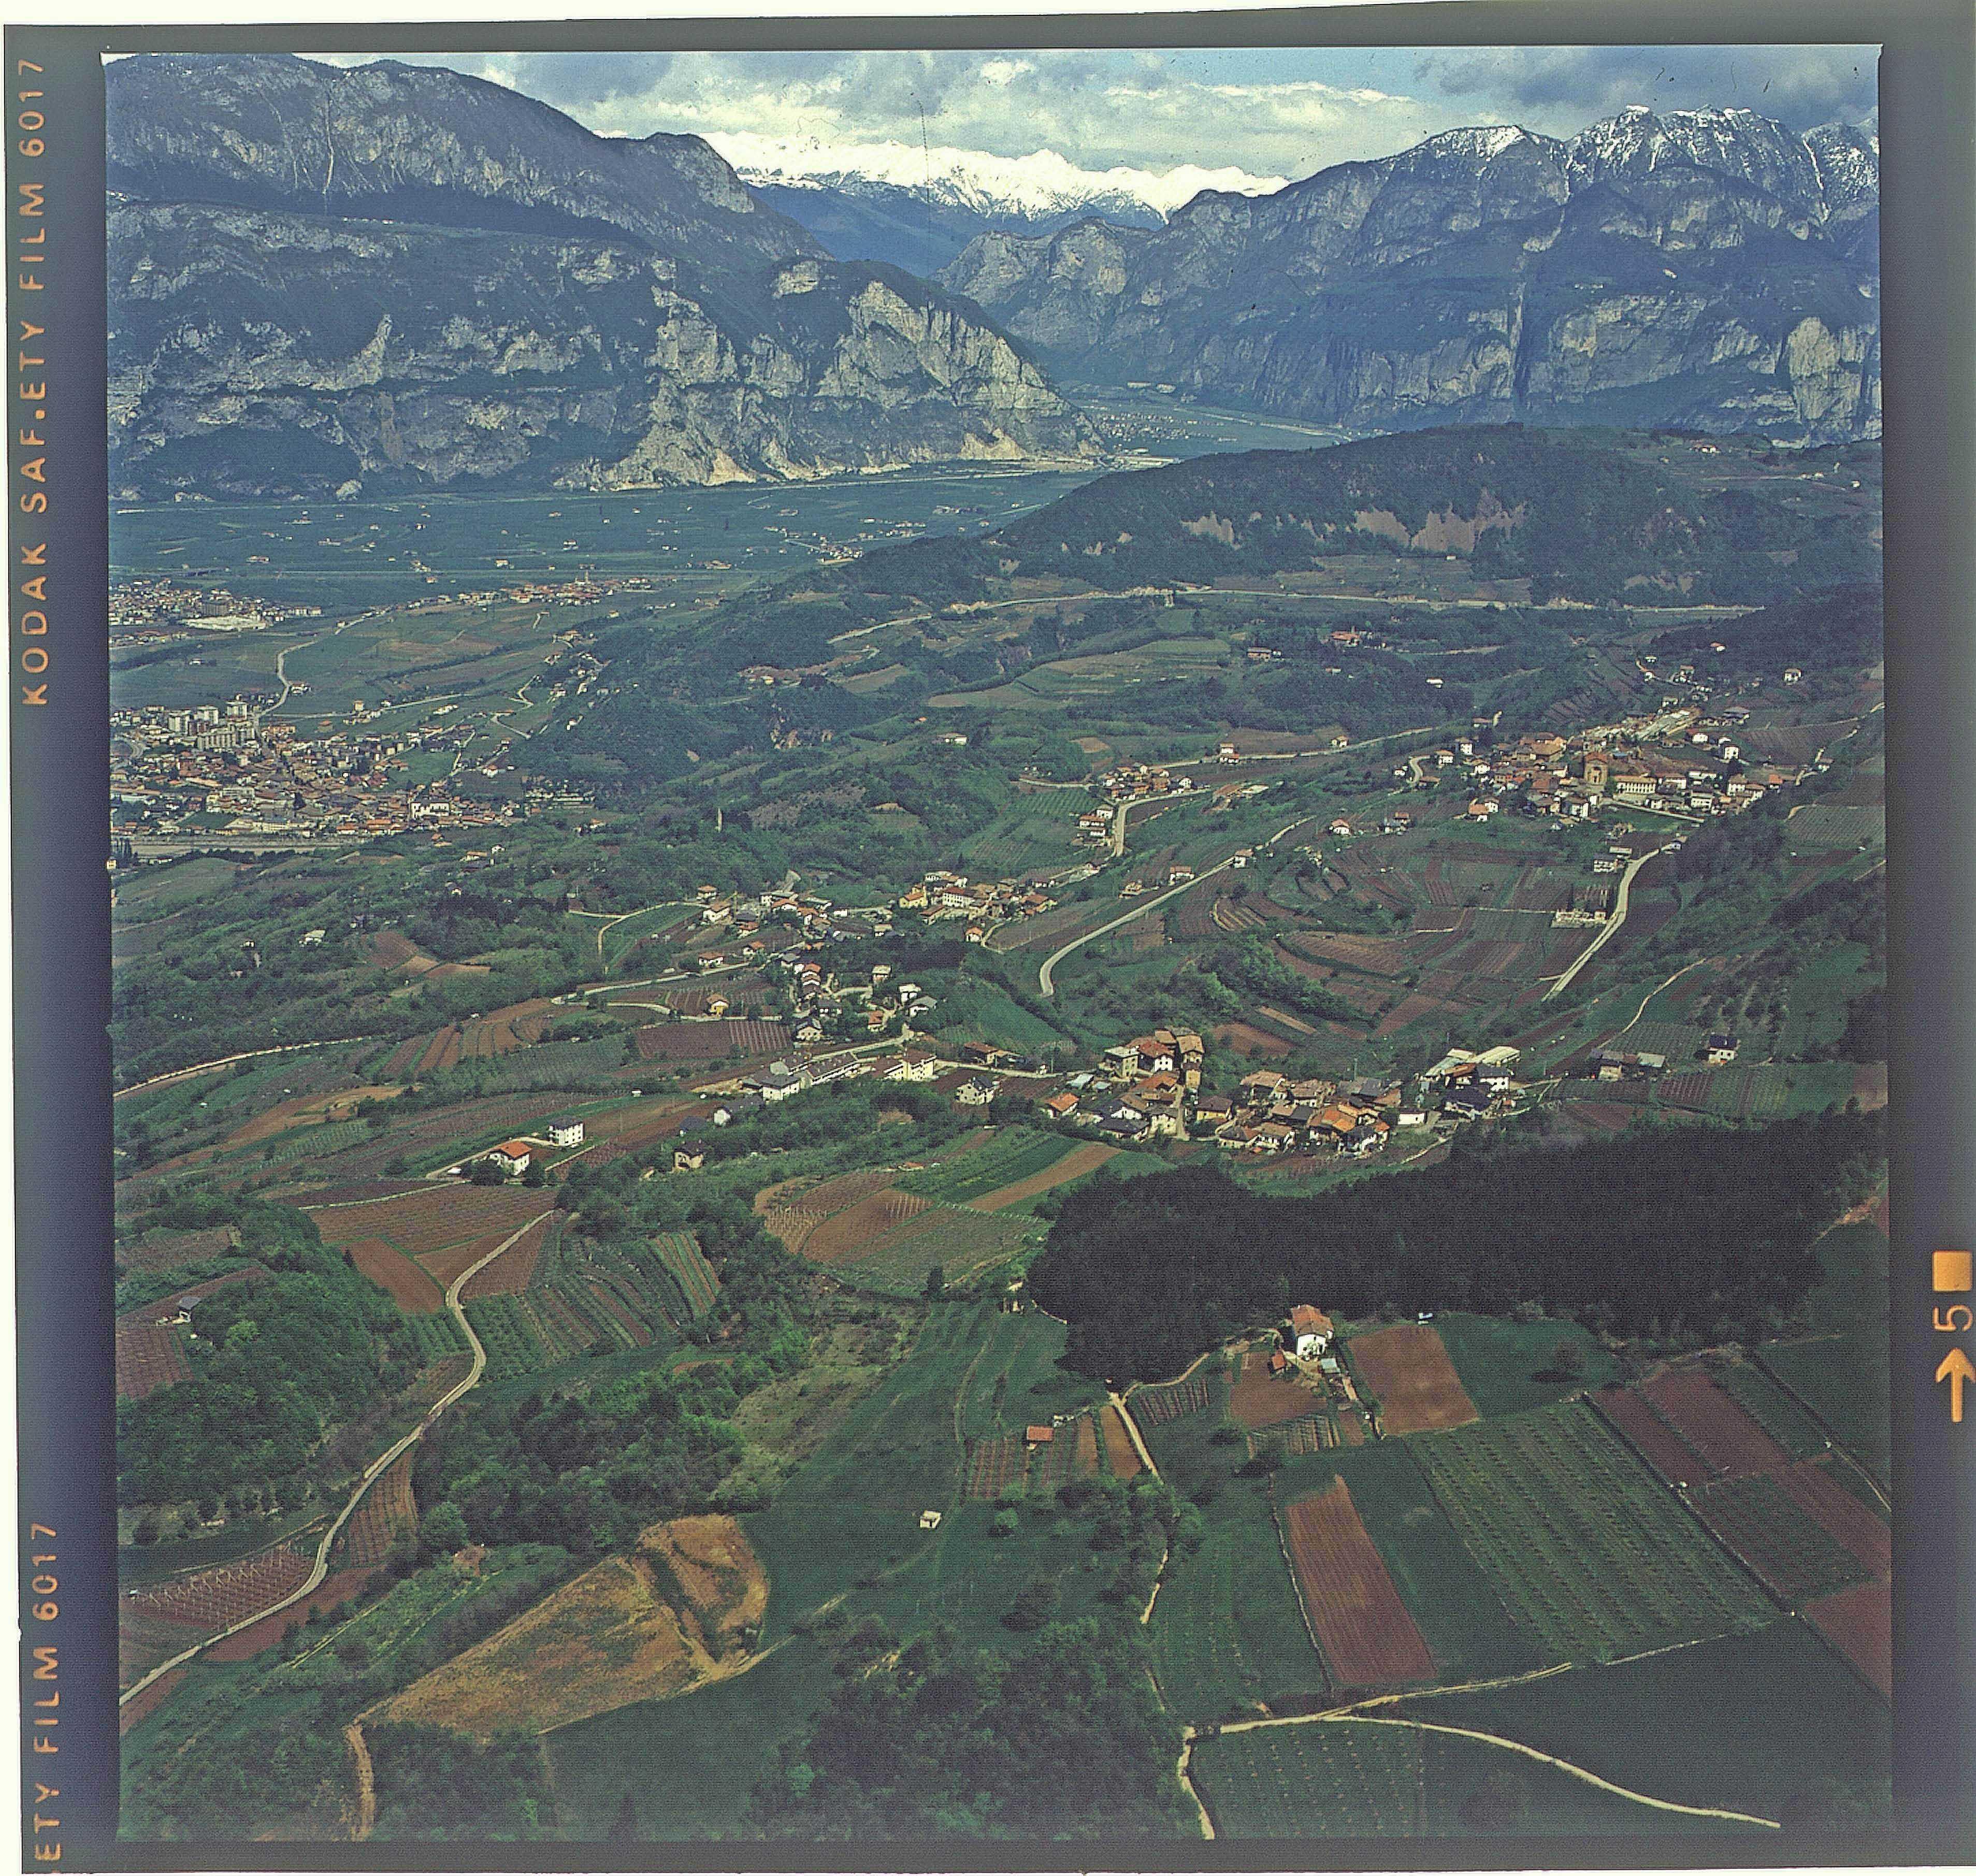 Gazzadina - Vigo Meano,